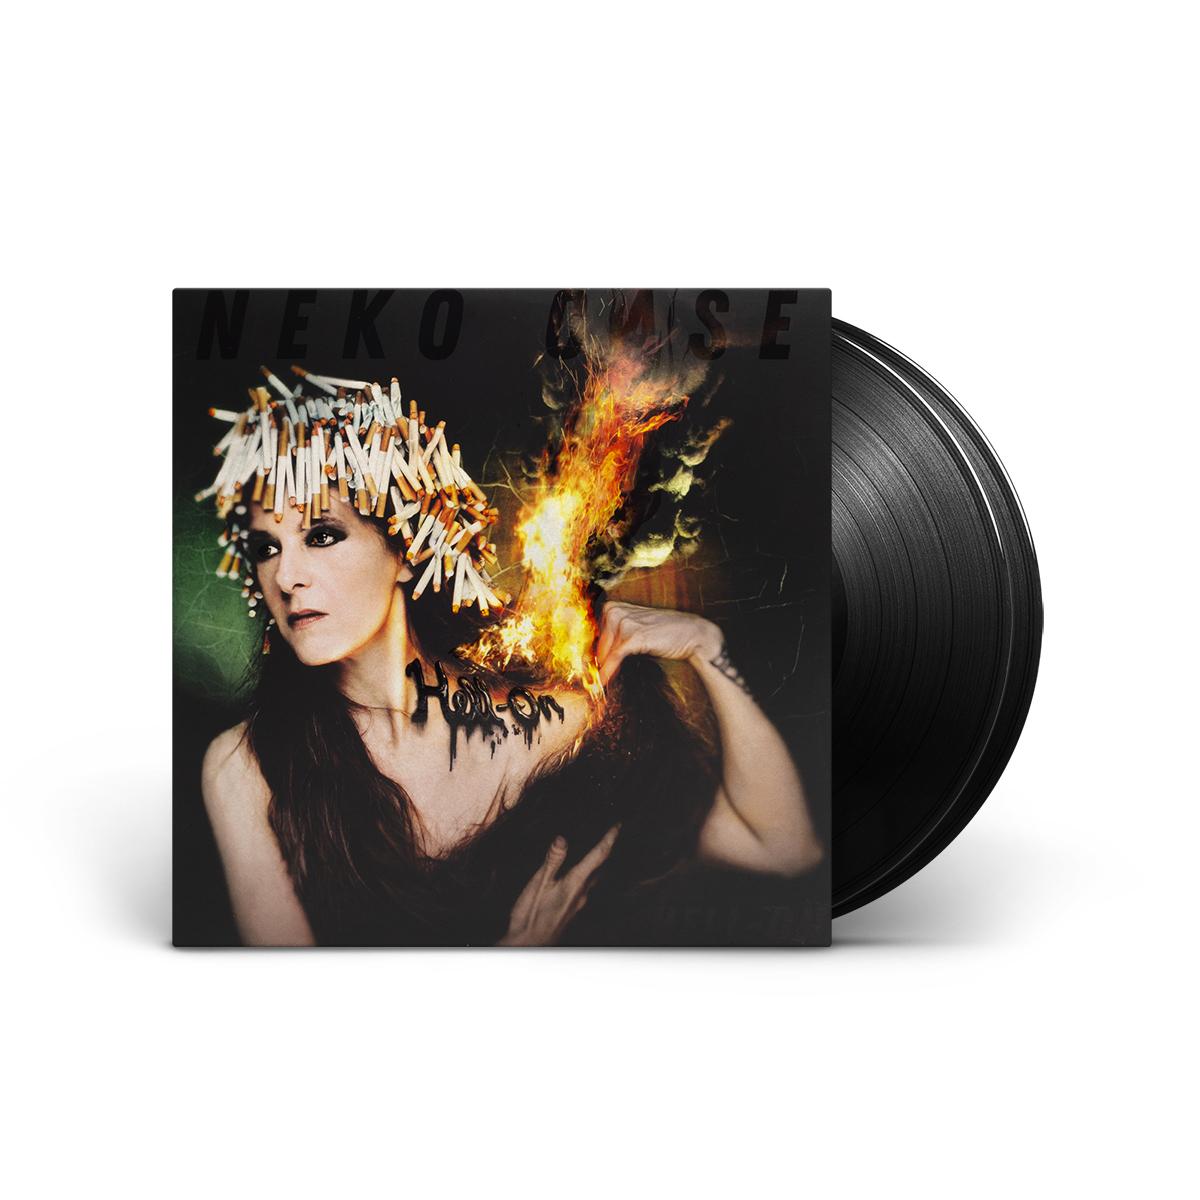 HELL-ON - Vinyl